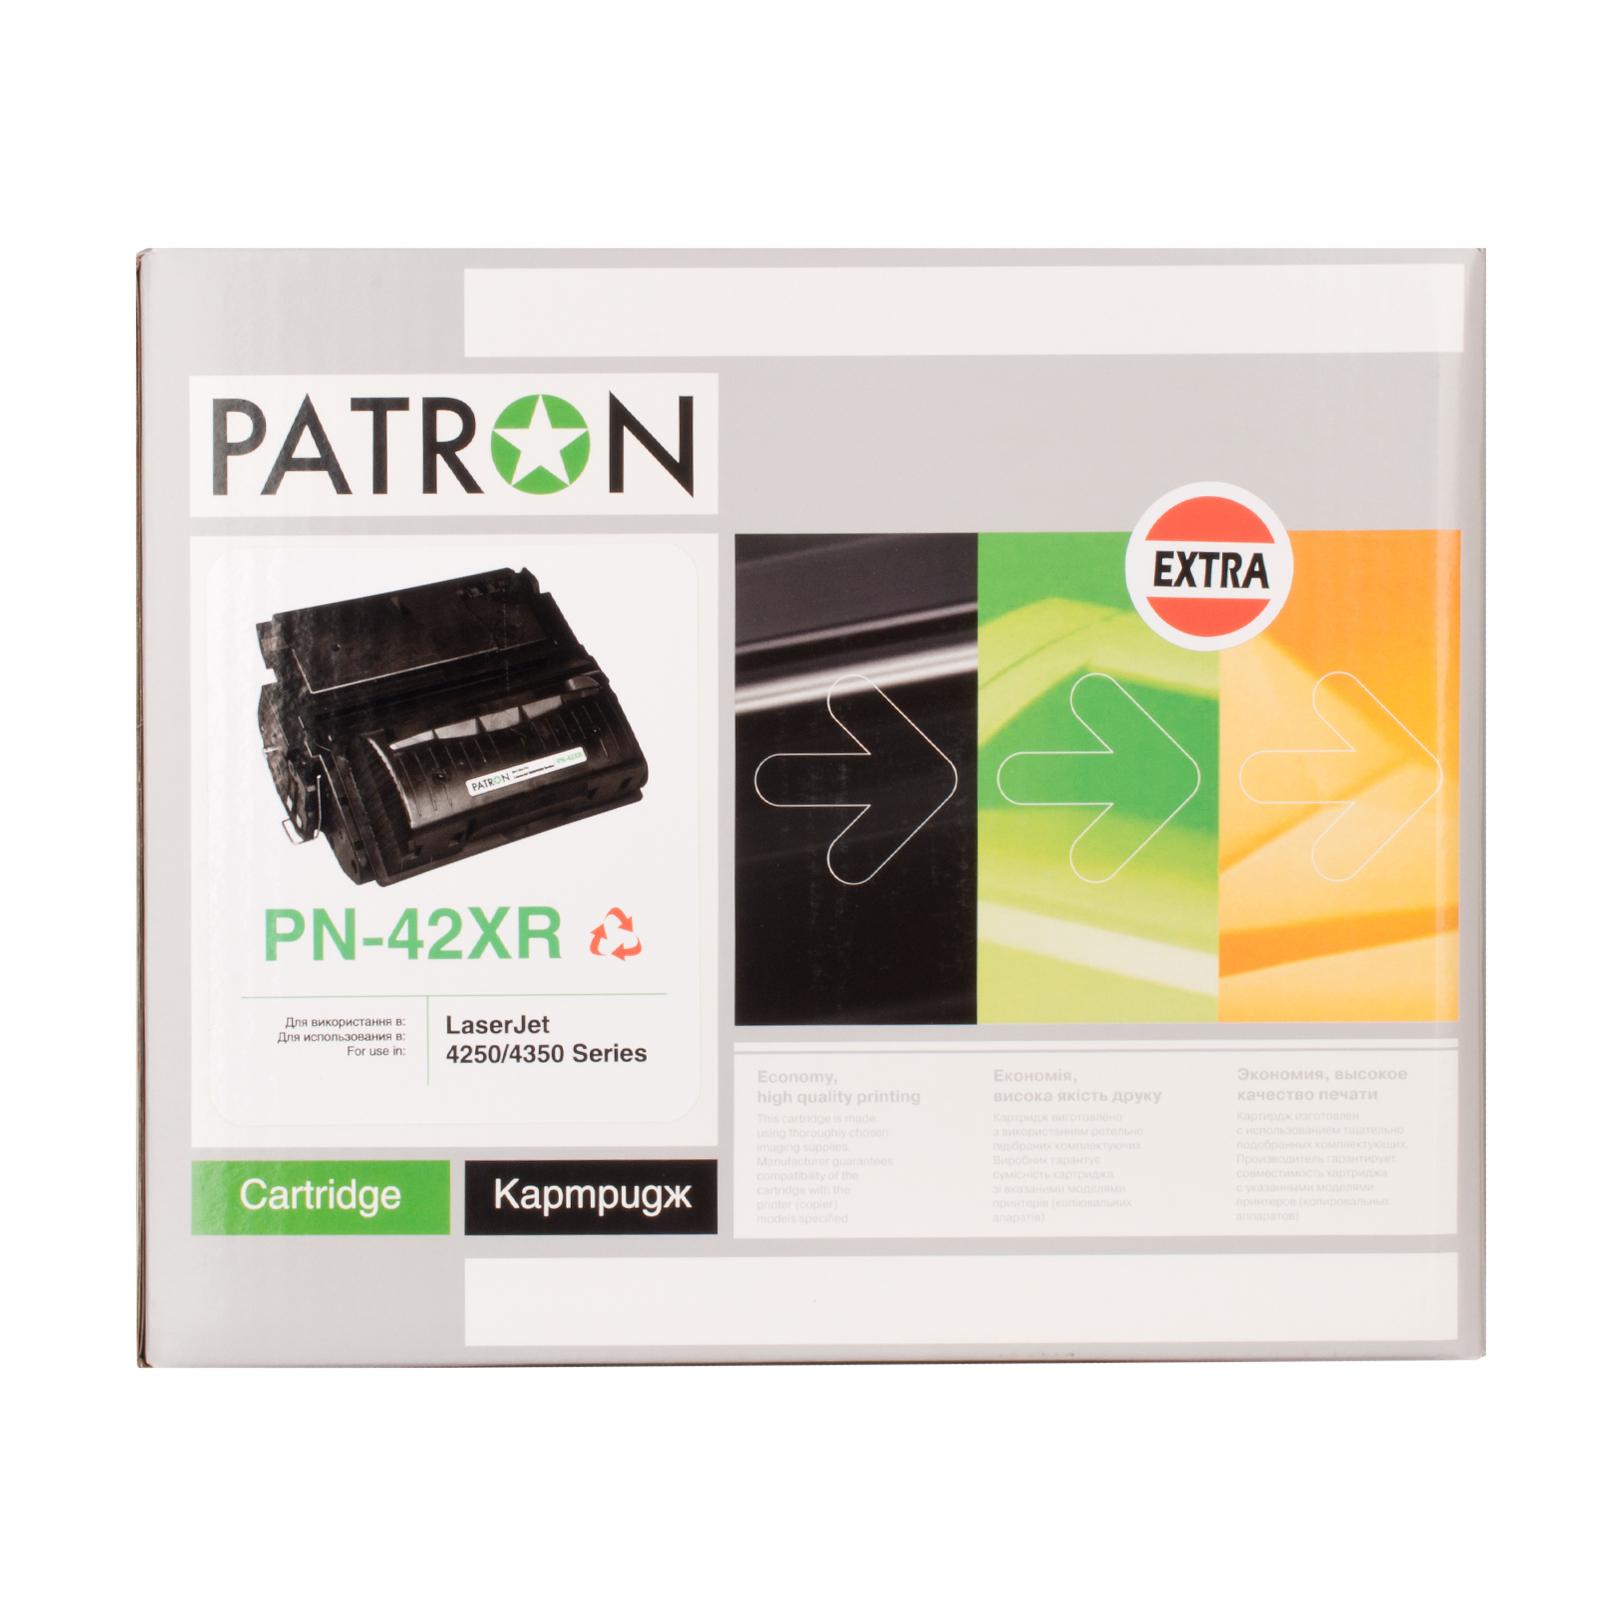 Картридж PATRON HP LJ4250/4350 /Q5942X (PN-42XR) Extra (CT-HP-Q5942X-PN-R) изображение 2